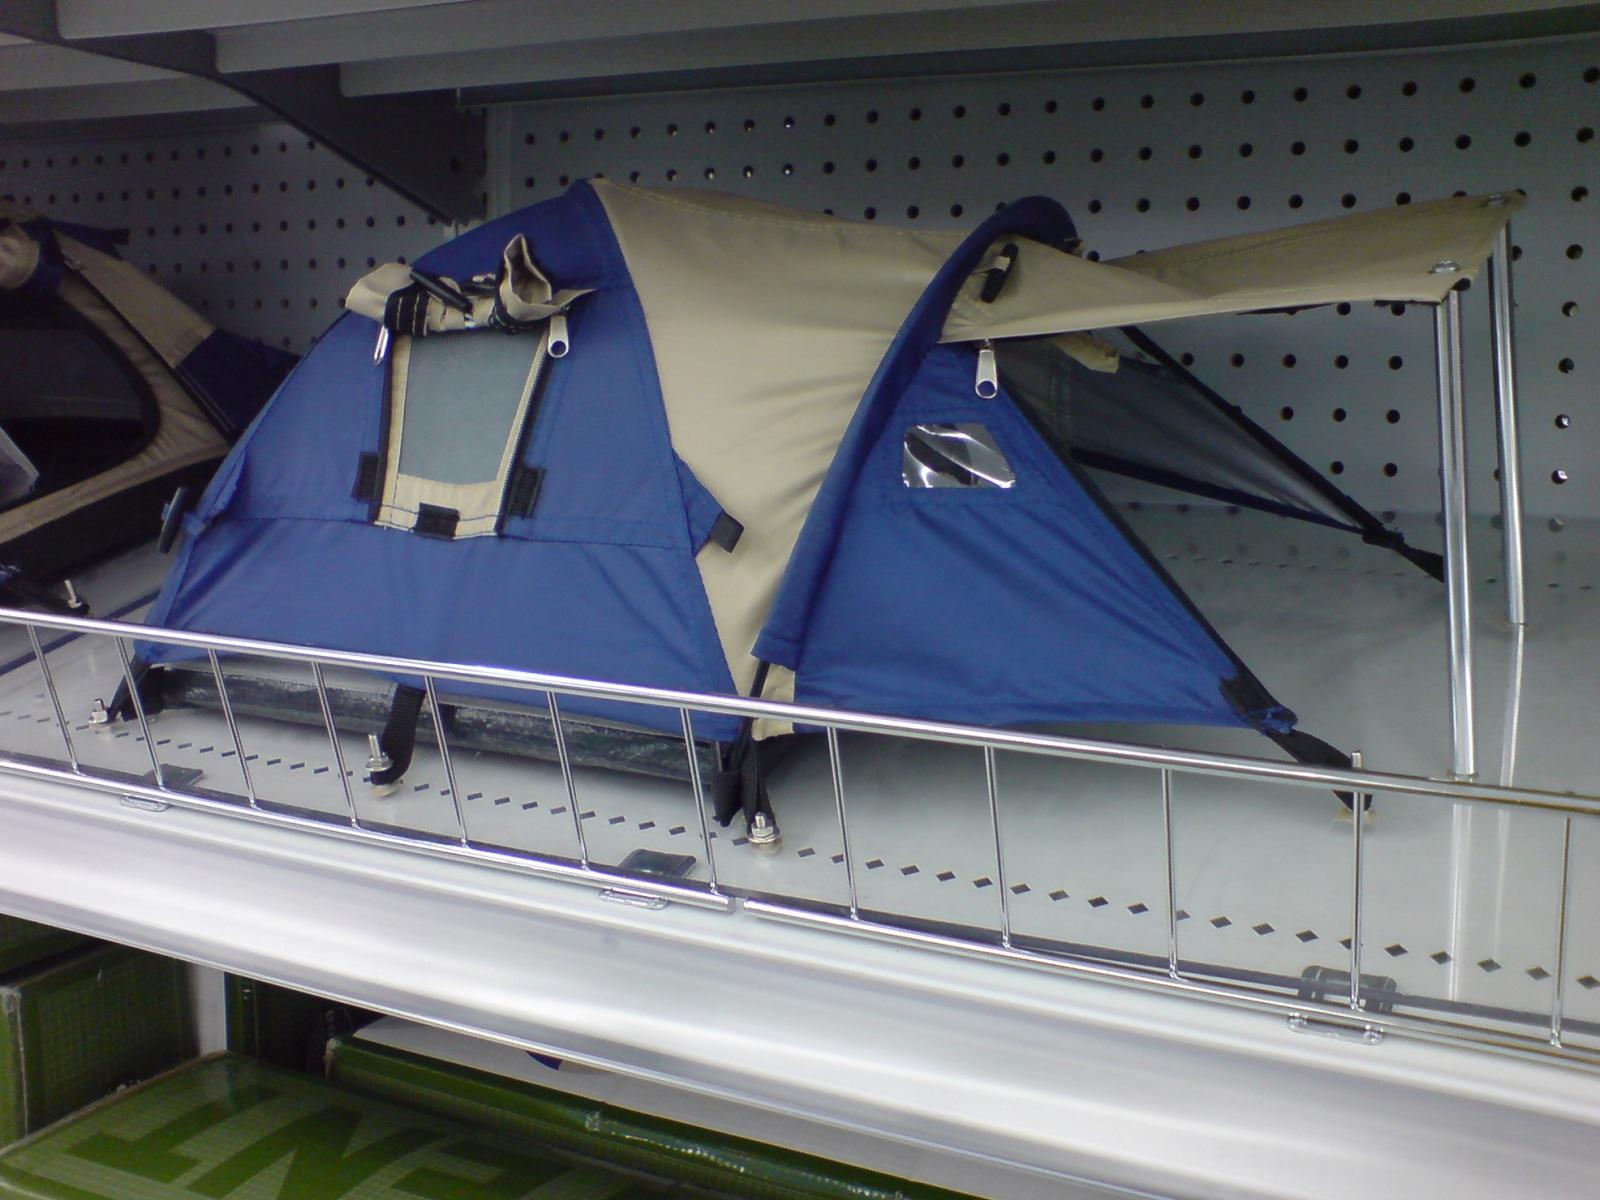 FileMiniature Tent Models For Sale.jpg & File:Miniature Tent Models For Sale.jpg - Wikimedia Commons